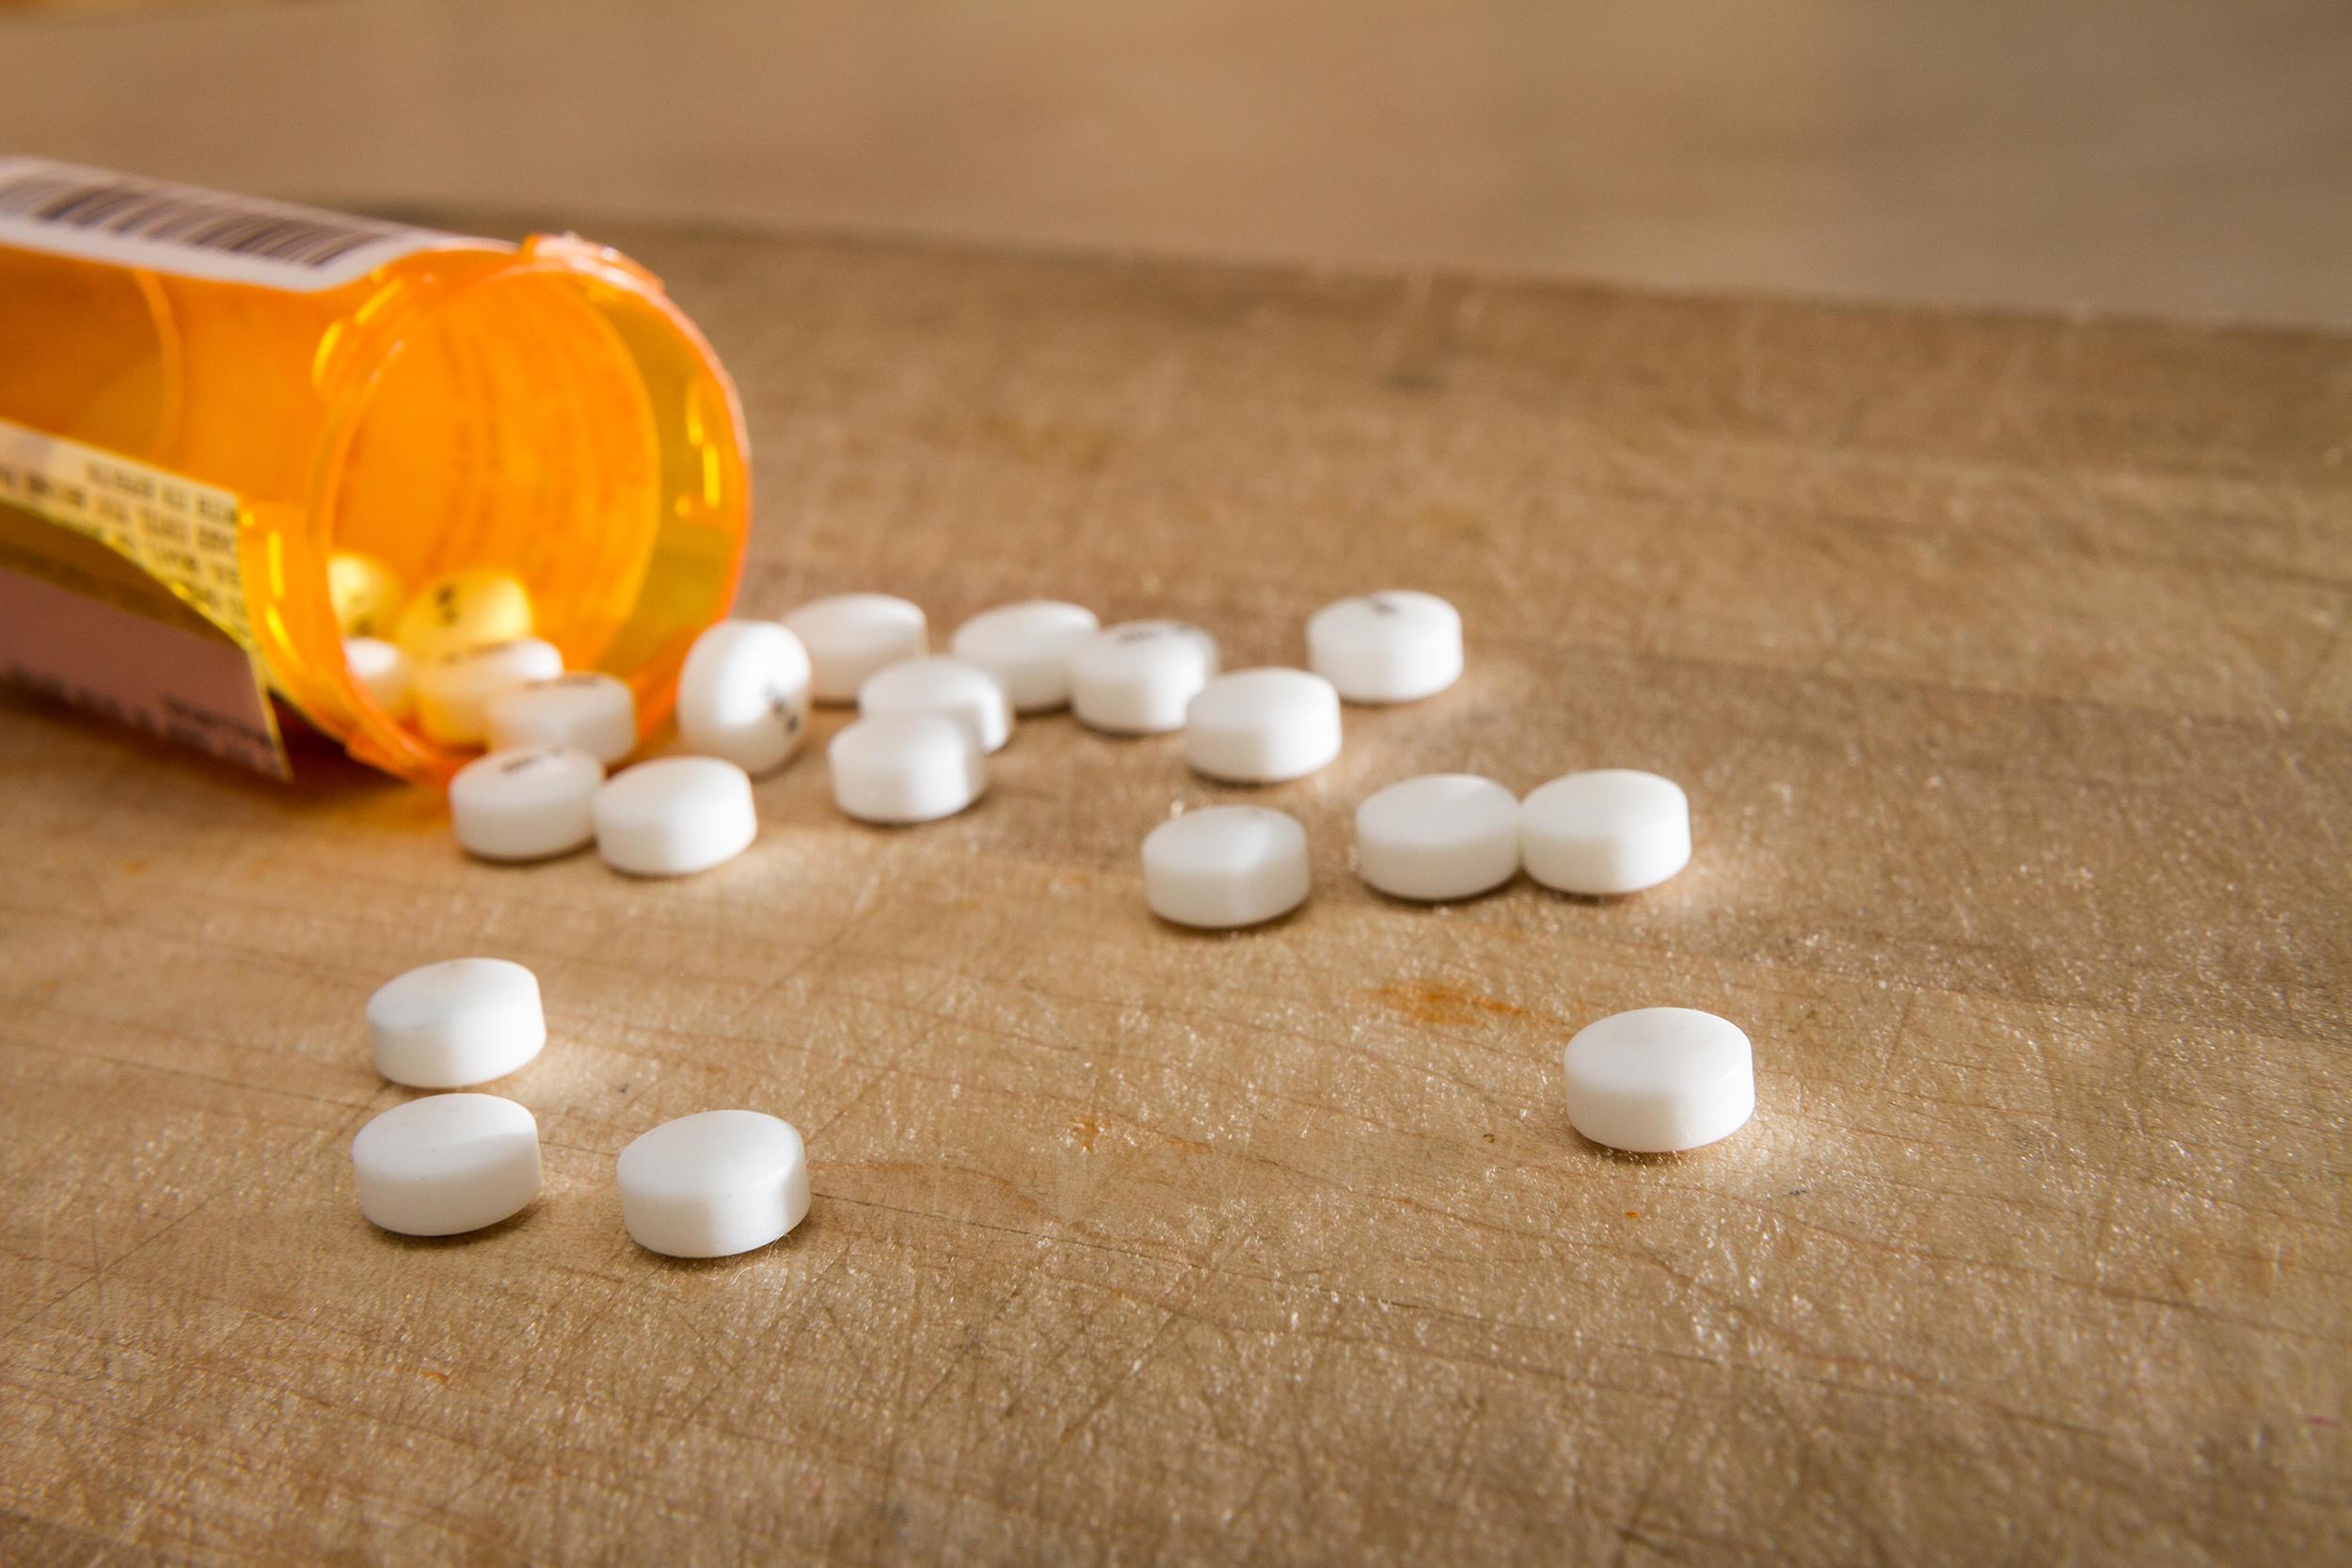 Prescription Opioid Addiction